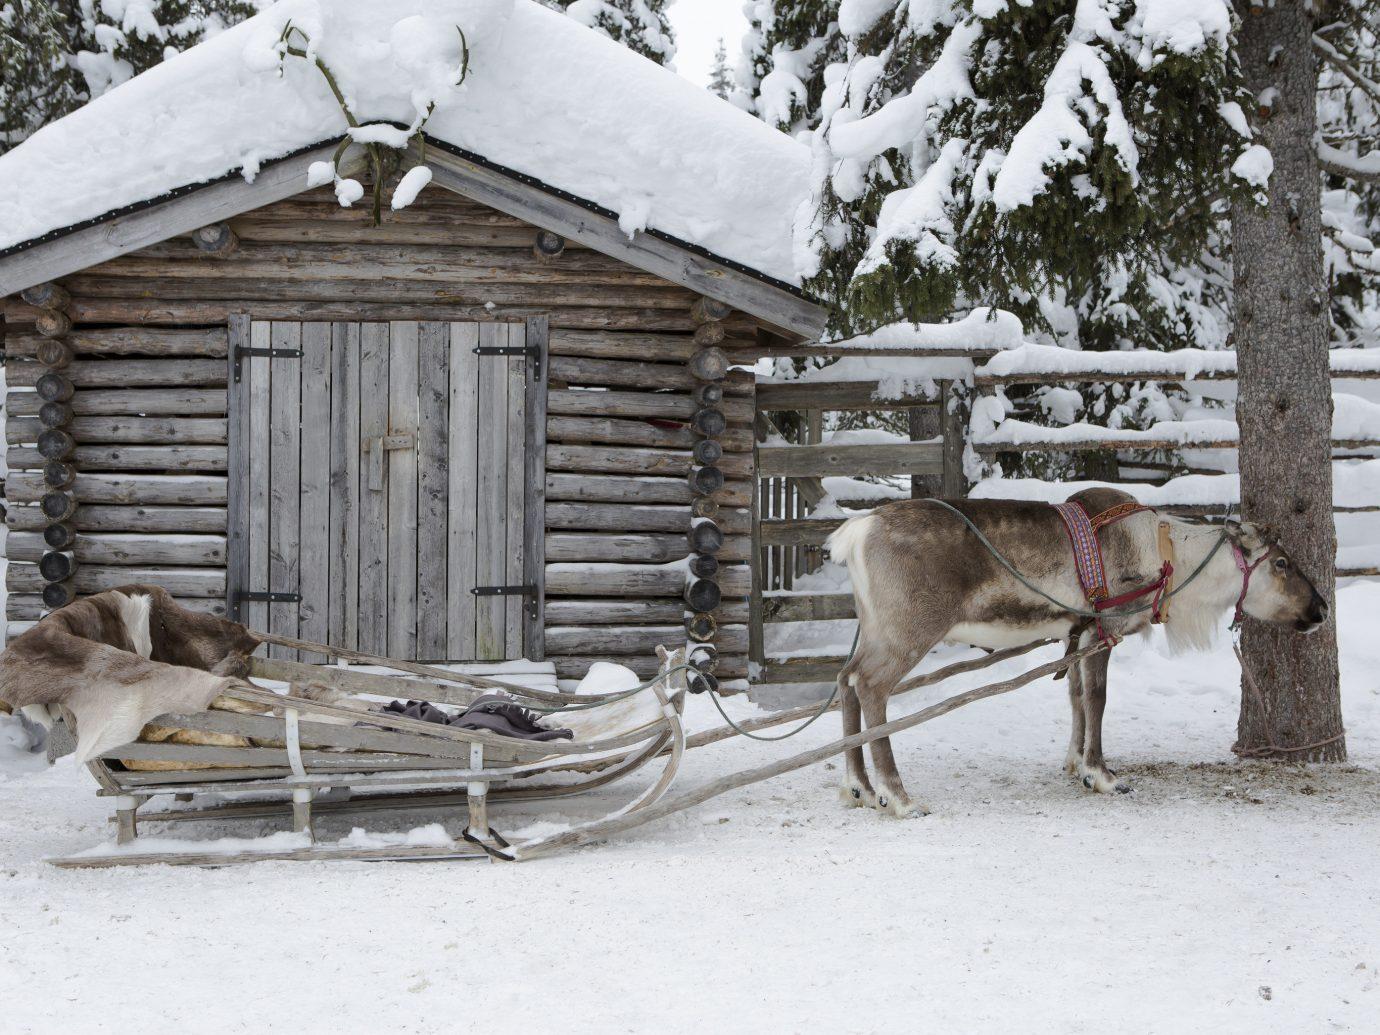 Adventure outdoor tree snow Winter reindeer log cabin house hut deer home wood sugar house freezing shed farm building